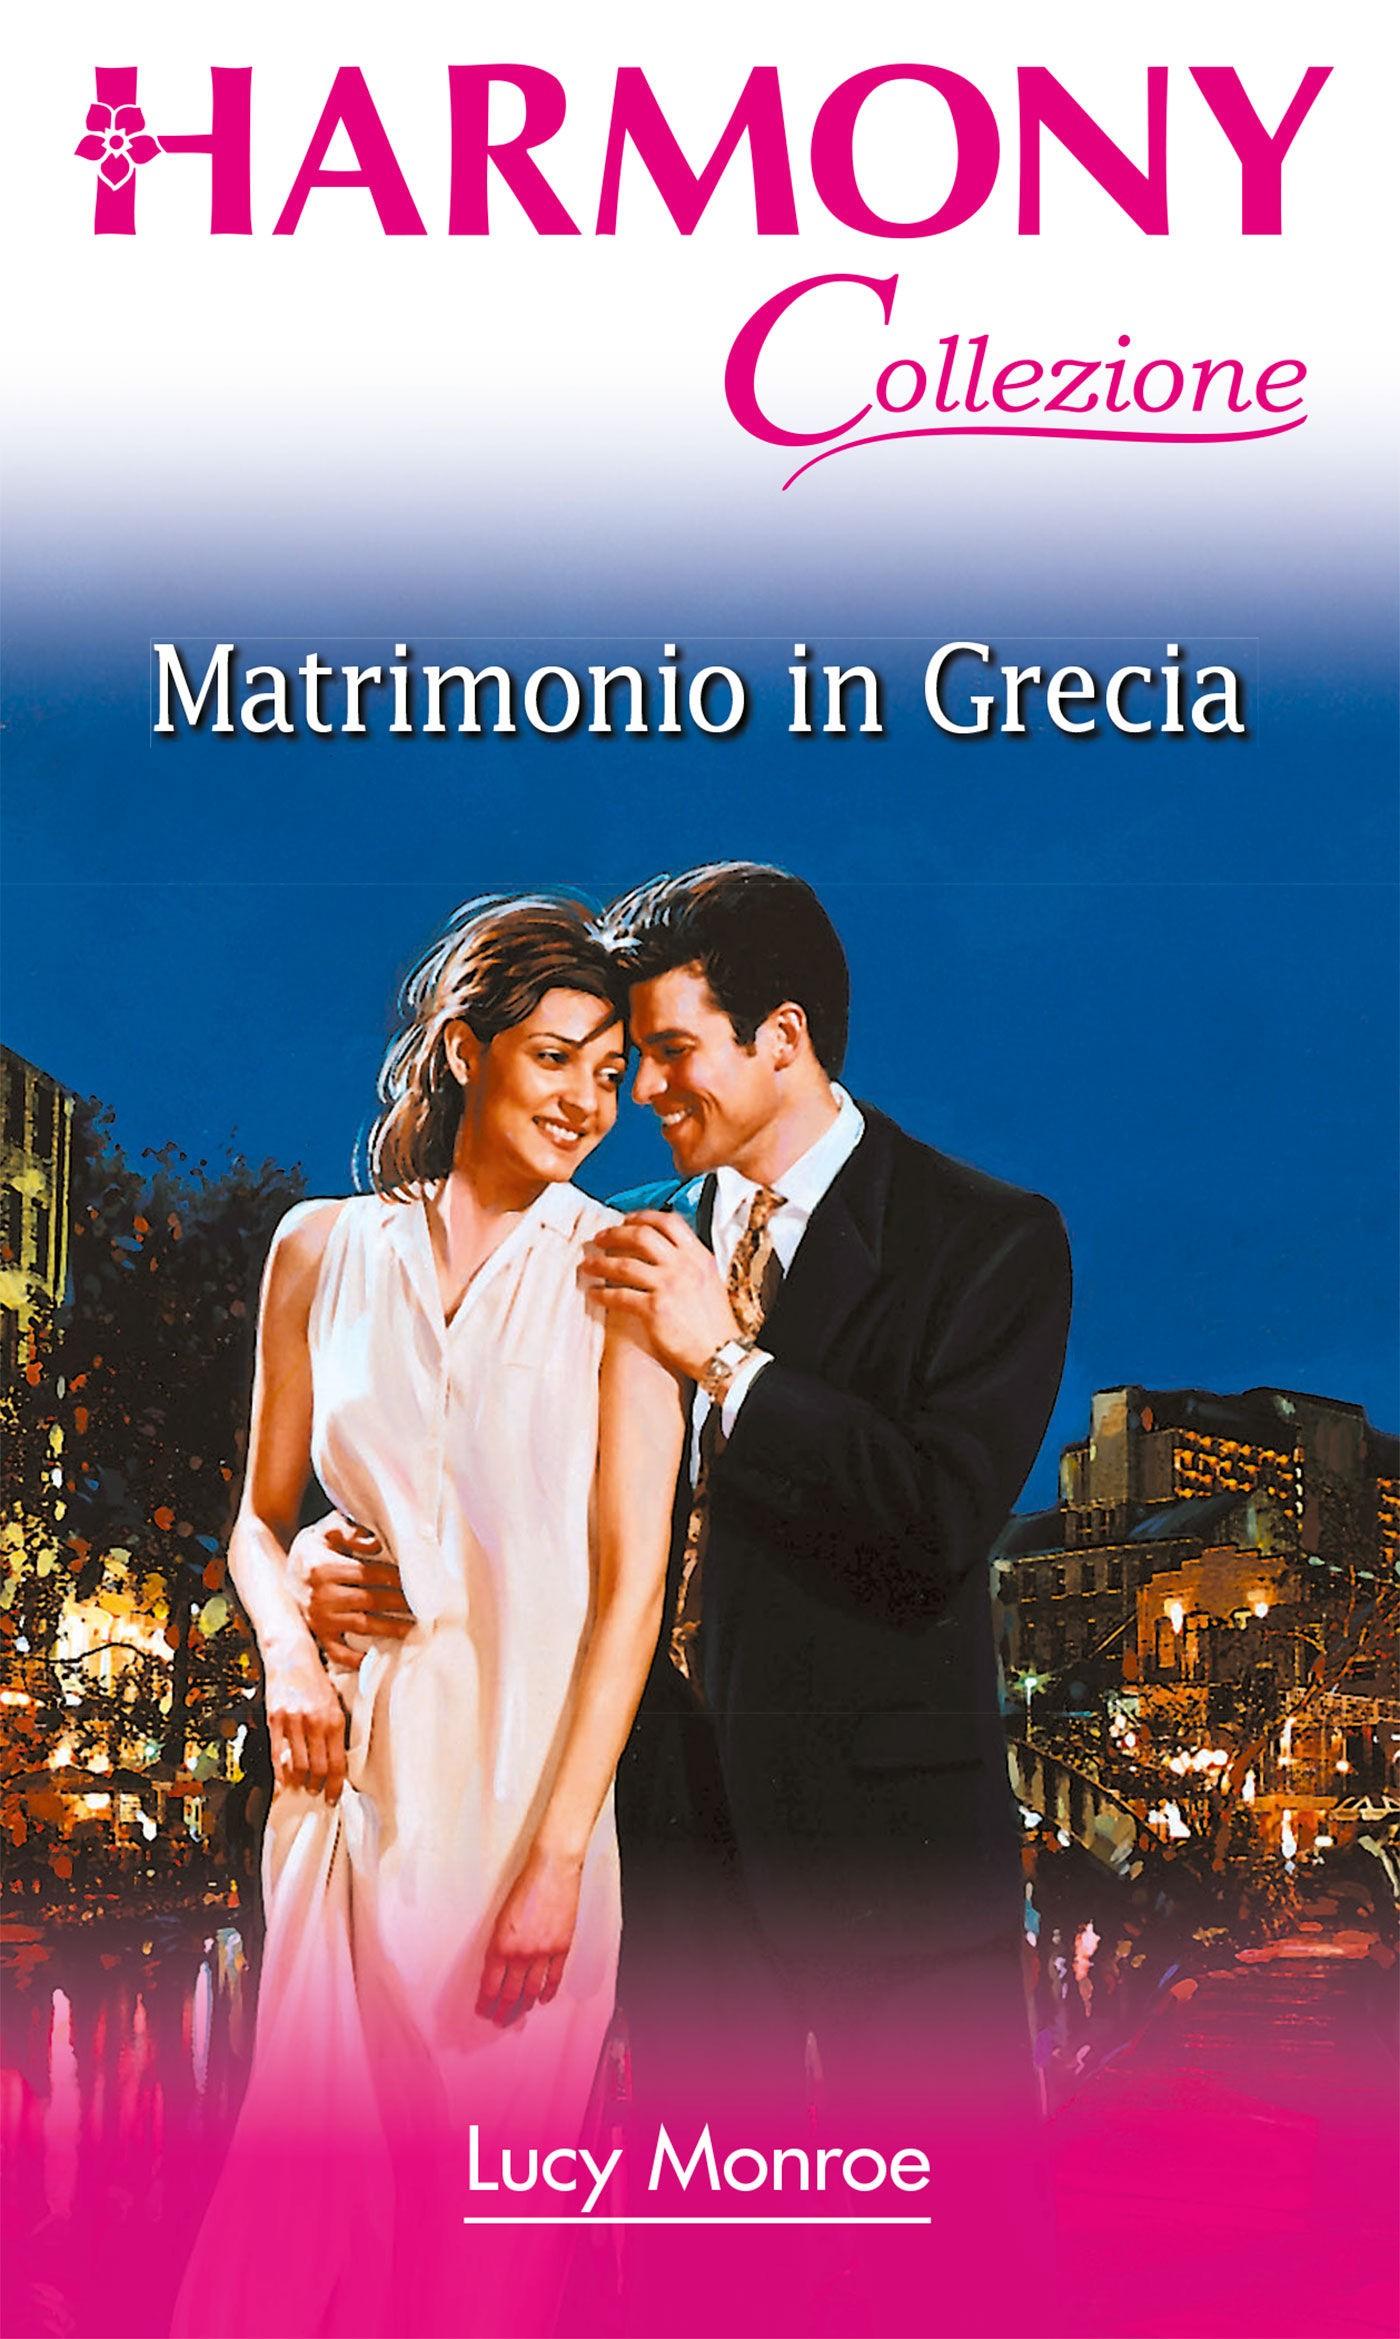 Matrimonio In Grecia : Matrimonio in grecia lucy monroe ebook bookrepublic